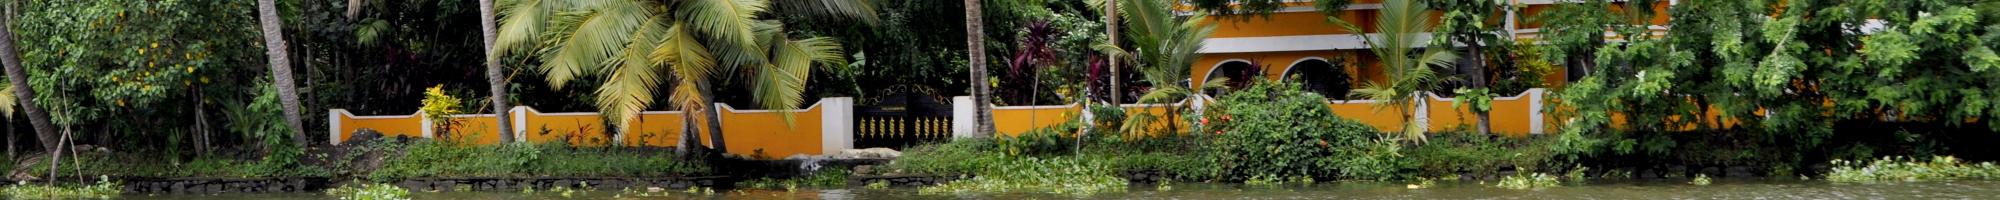 https://www.intakt-reisen.de/wp-content/themes/intakt-reisen-de/img/slideshow/Backwaters in Kerala